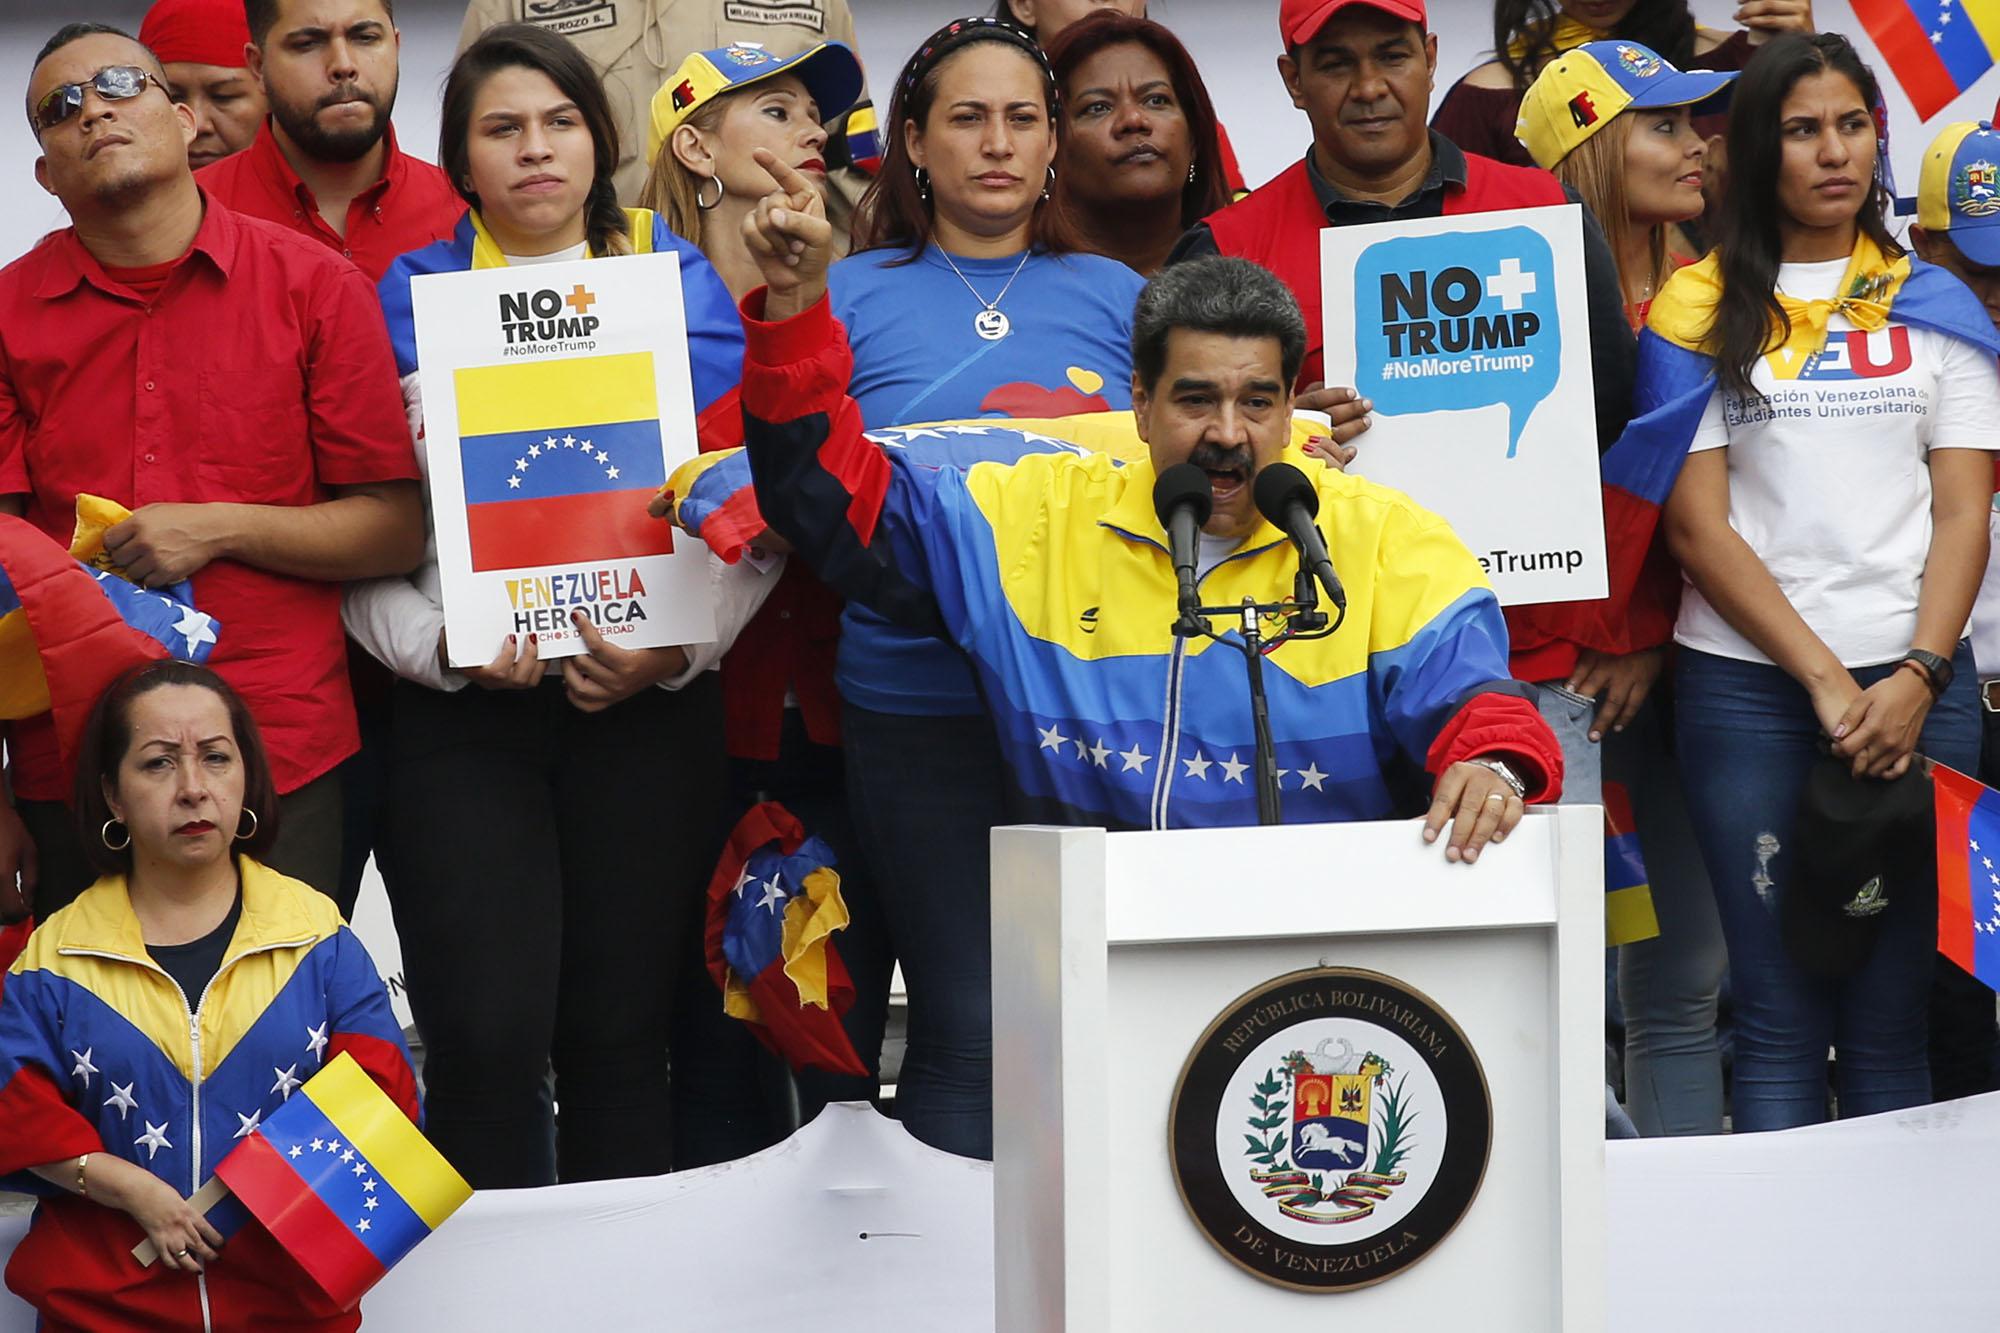 Venezuelan president Nicolas Maduro addresses a crowd at a rally condemning US sanctions.